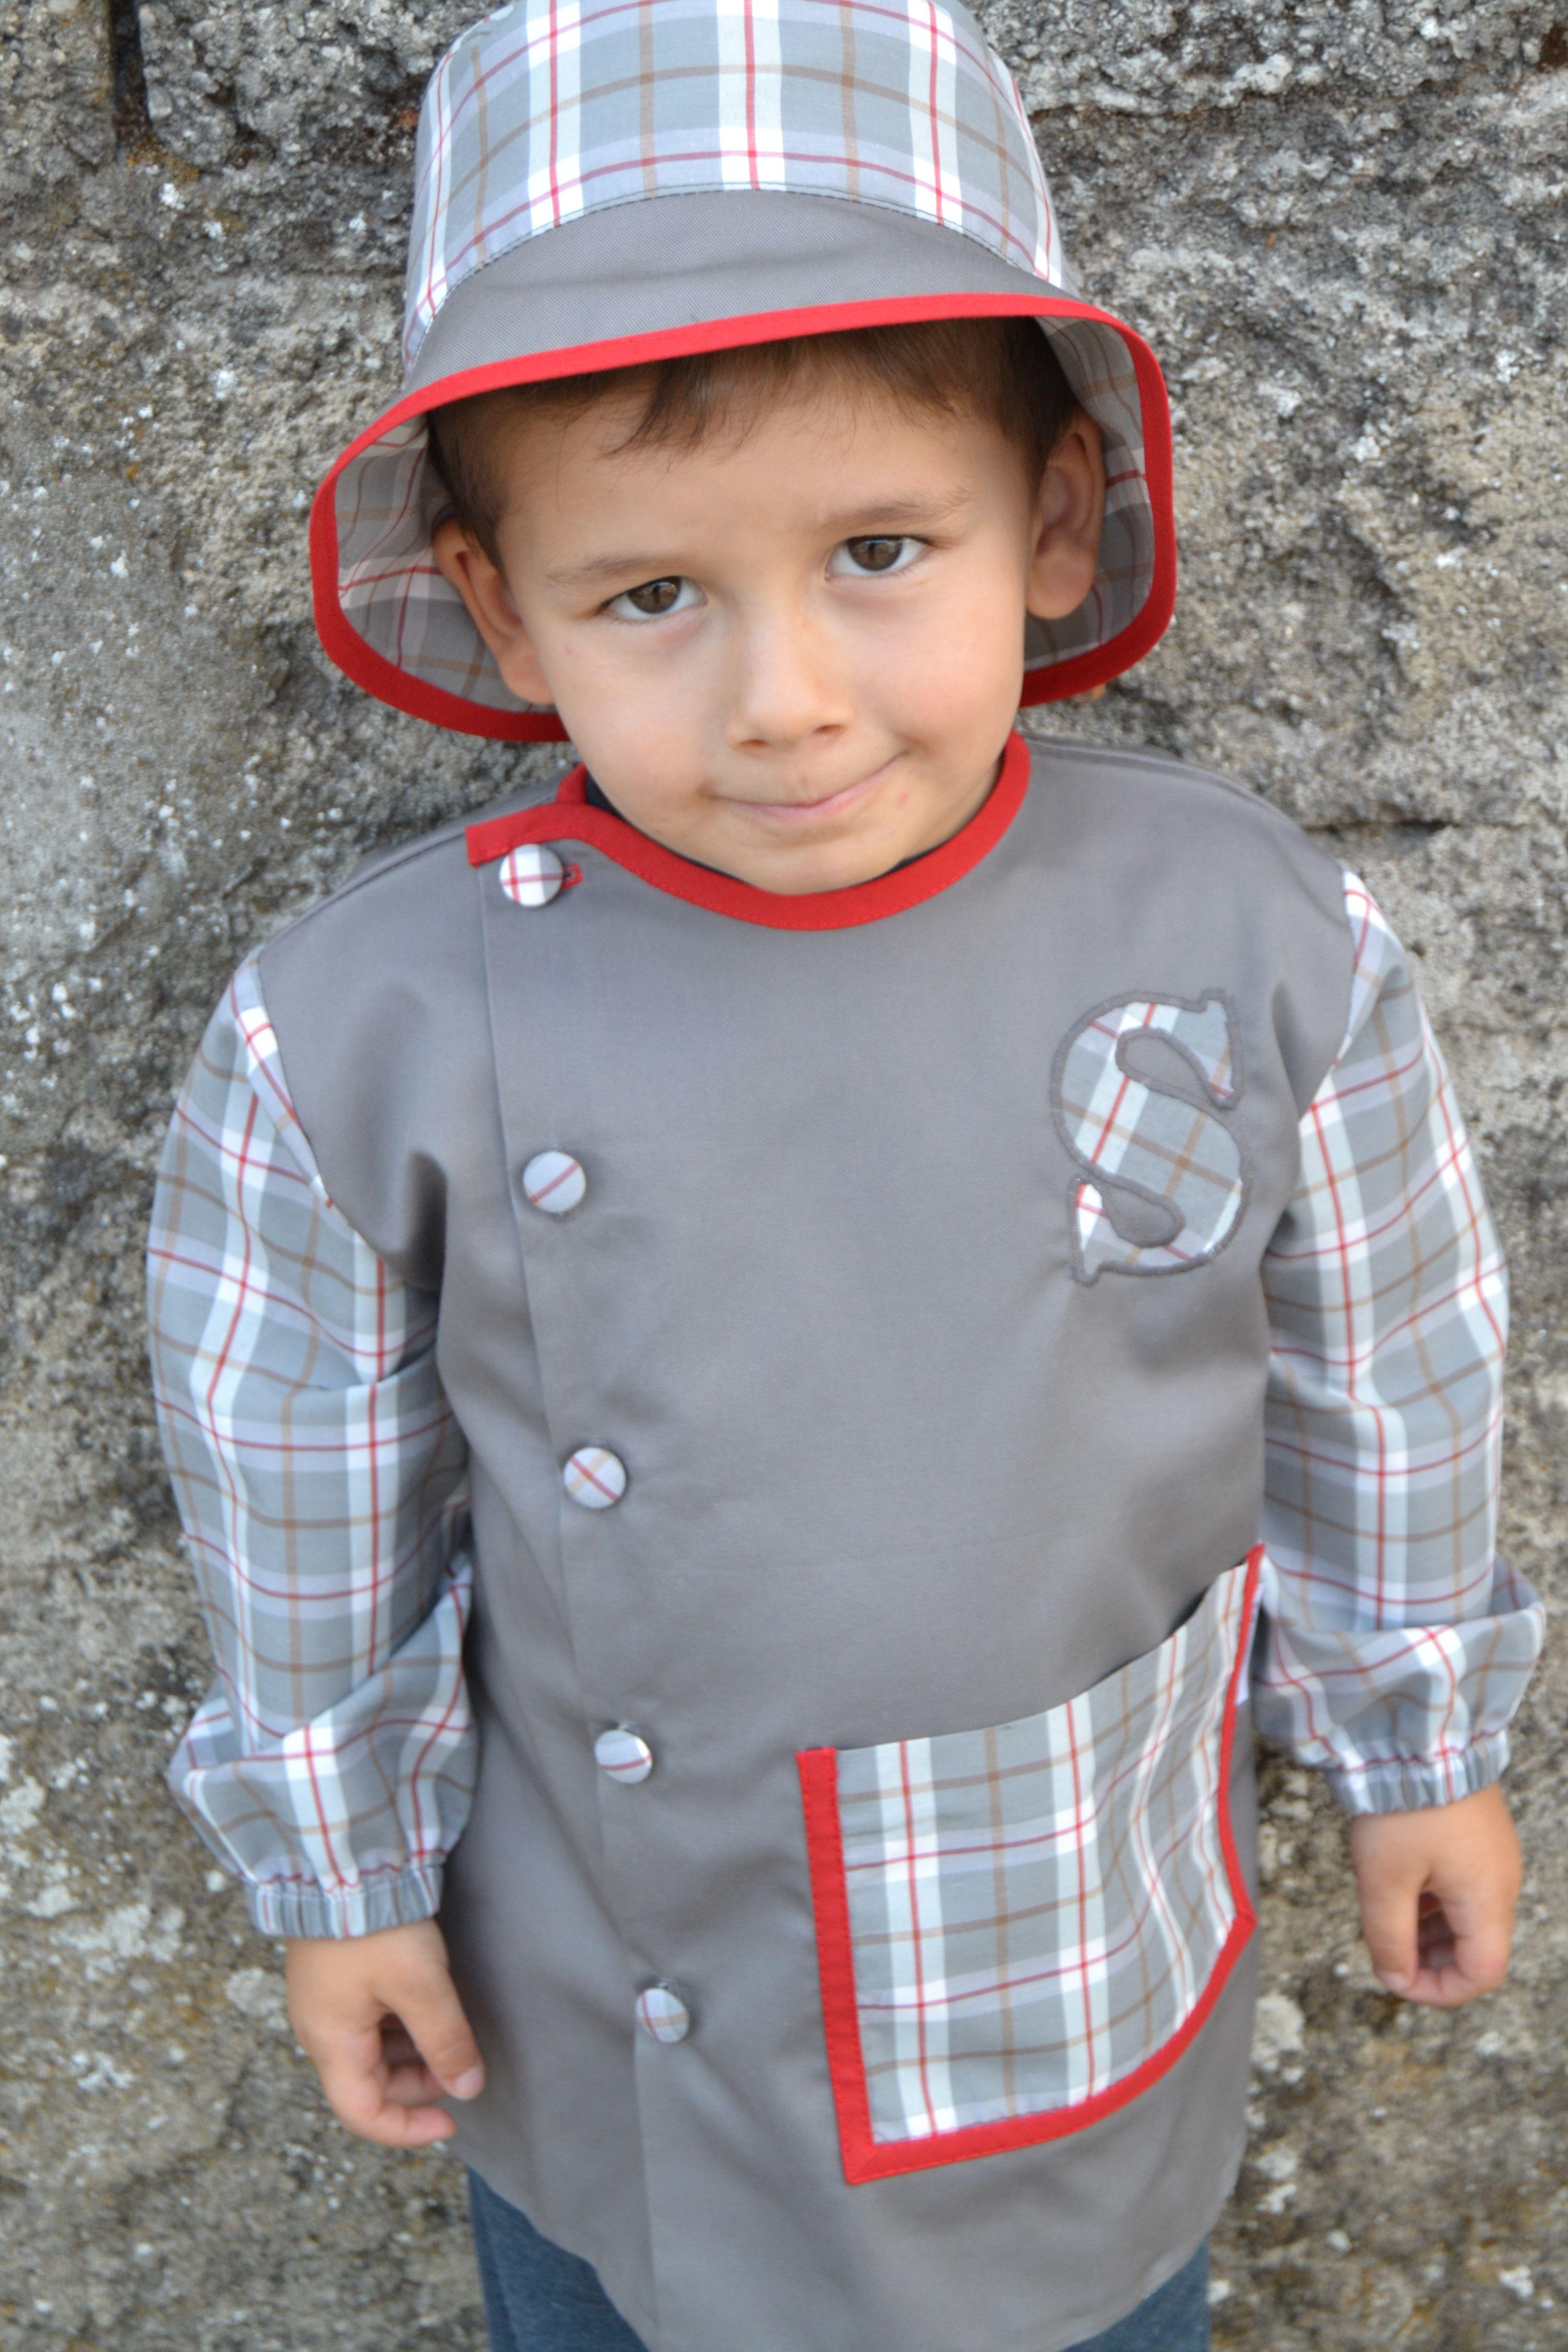 213e423536d0c bata escolar e chapeu personalizados